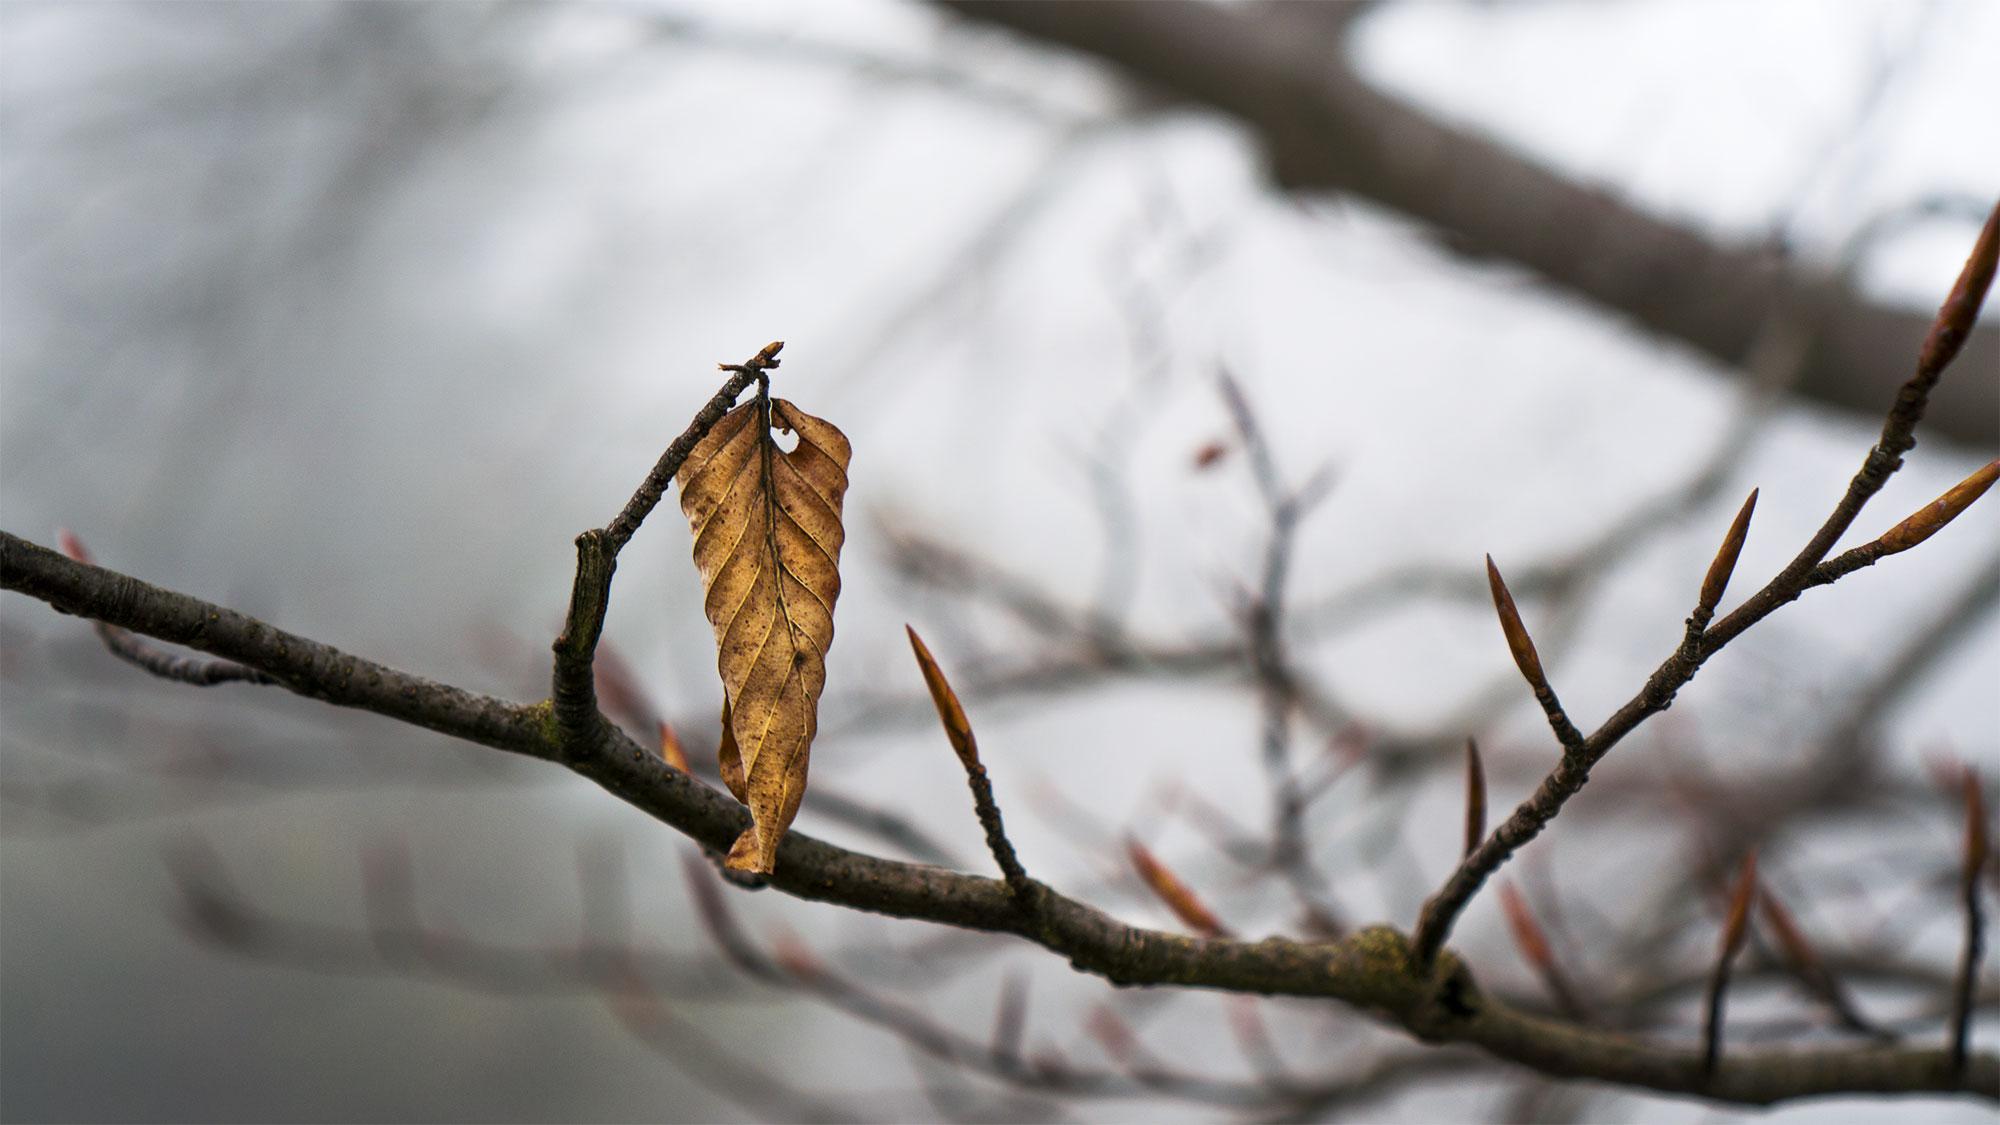 leaf varazze riccardo bernucci photo